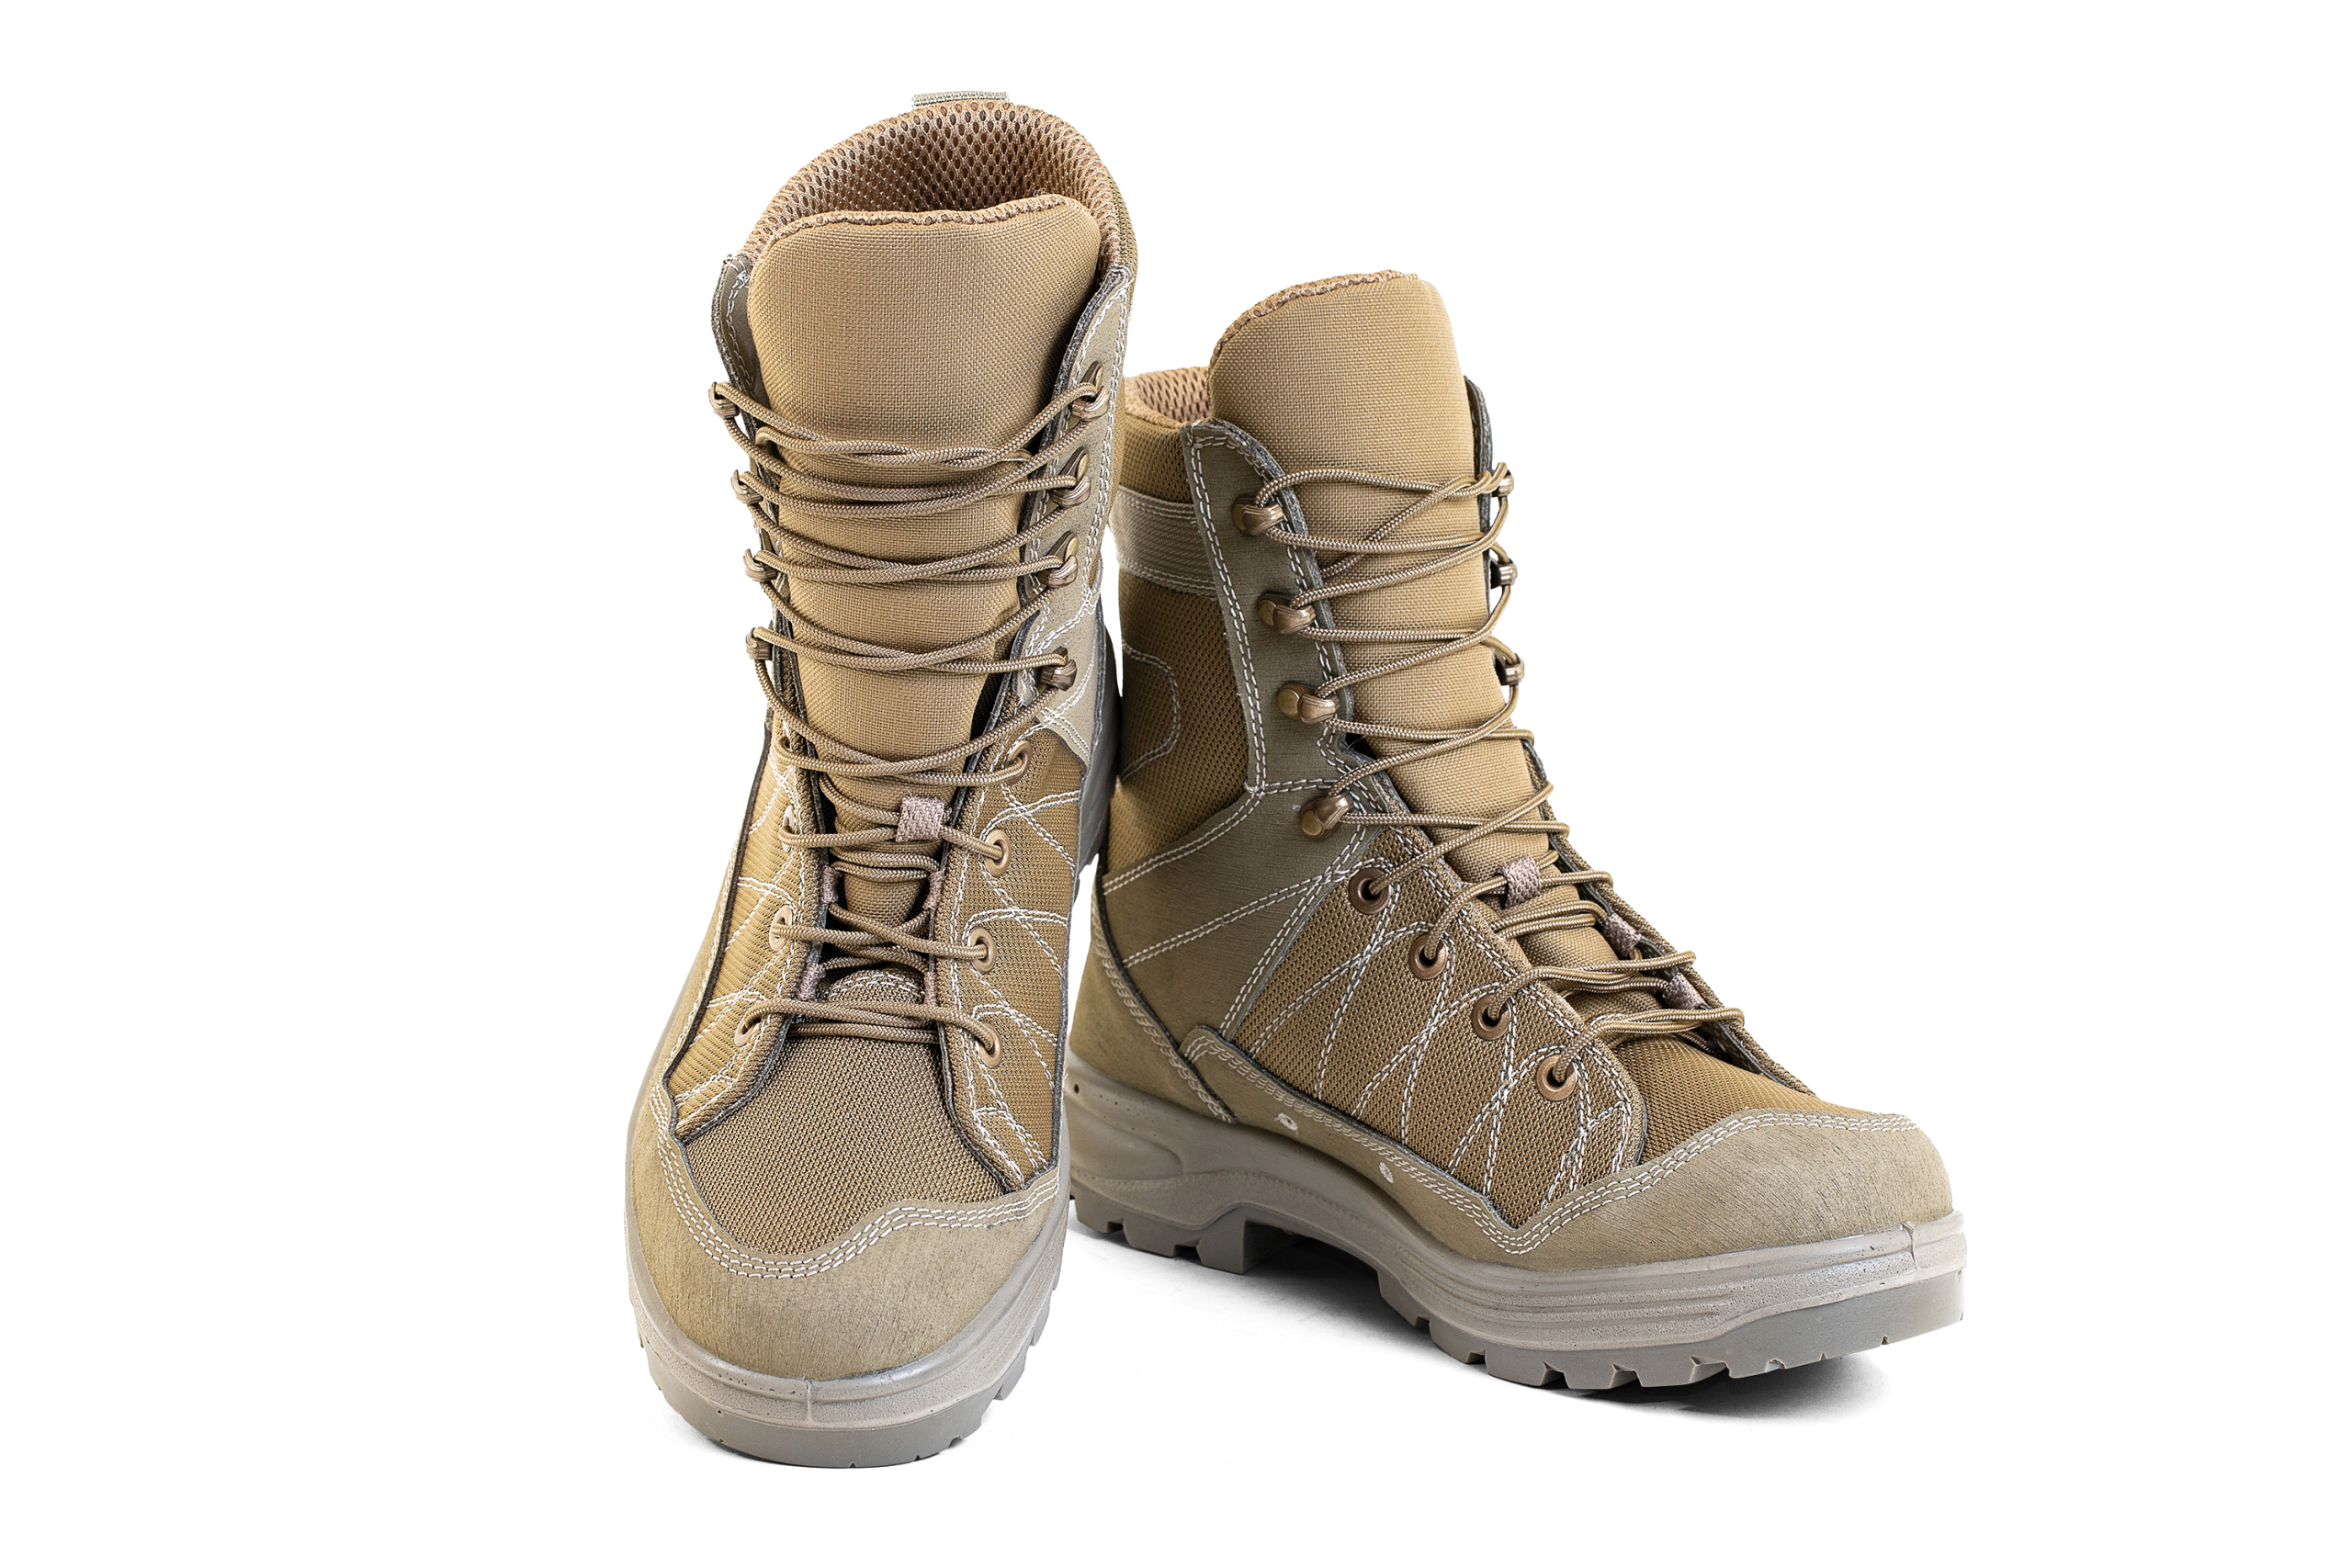 MB™ Multiseason Boots